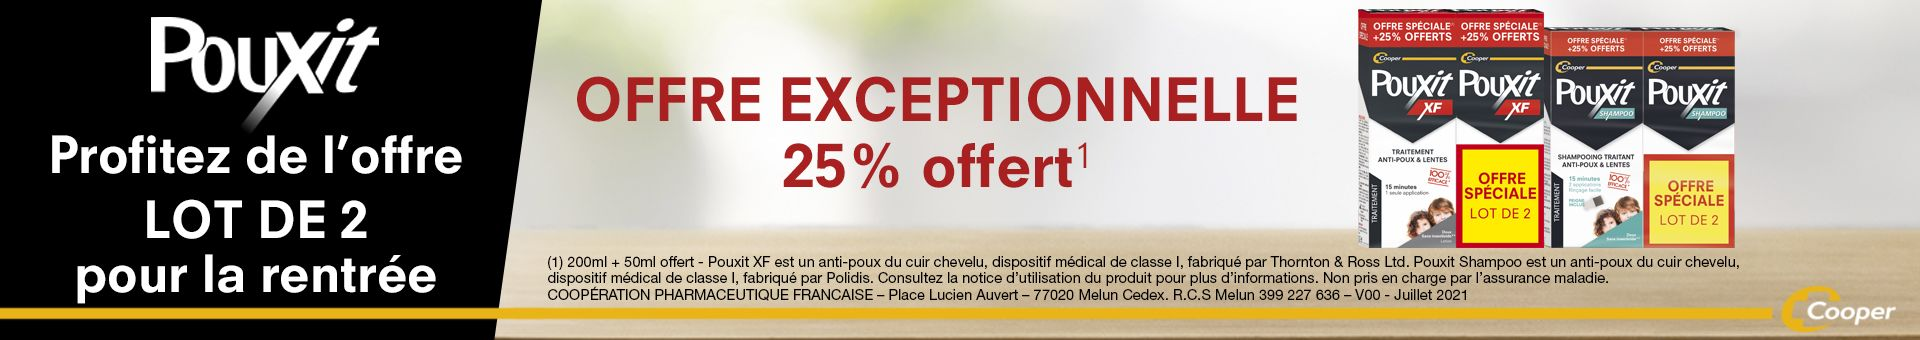 Pharmacie Patton,Saint-Avold